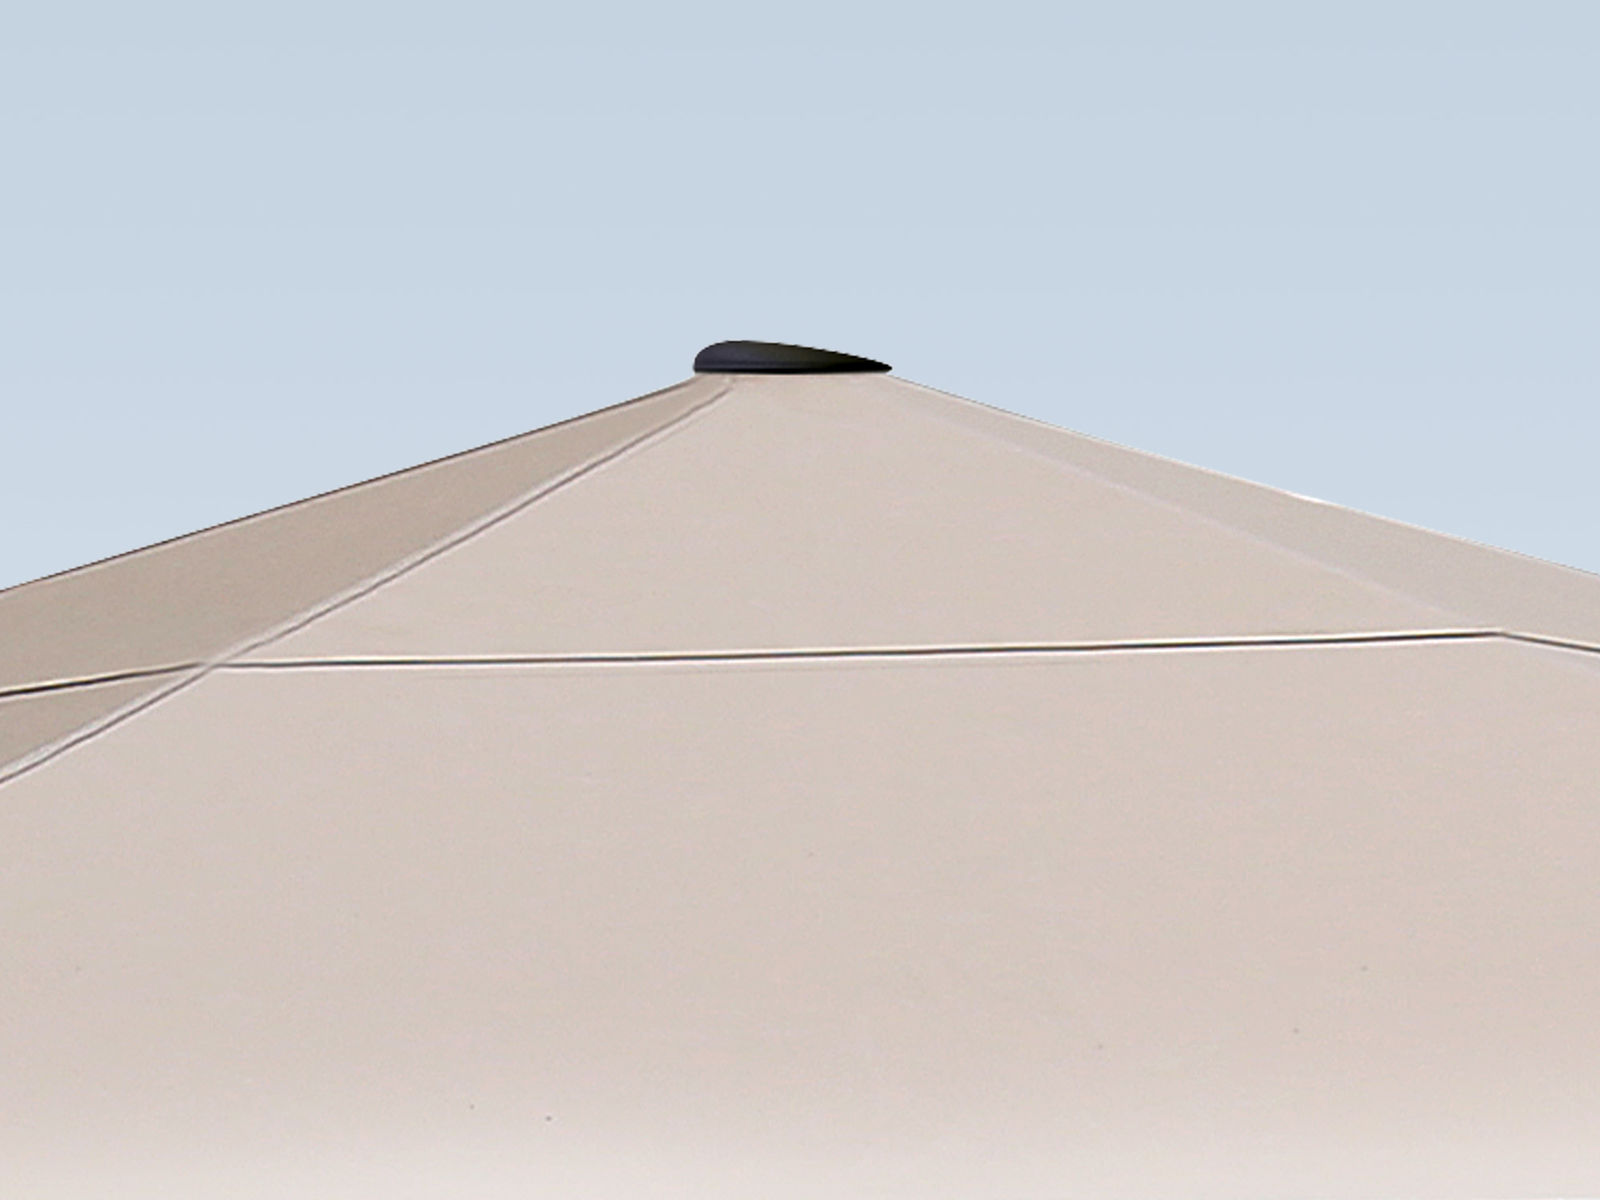 type s16 tension umbrella mdt tex. Black Bedroom Furniture Sets. Home Design Ideas